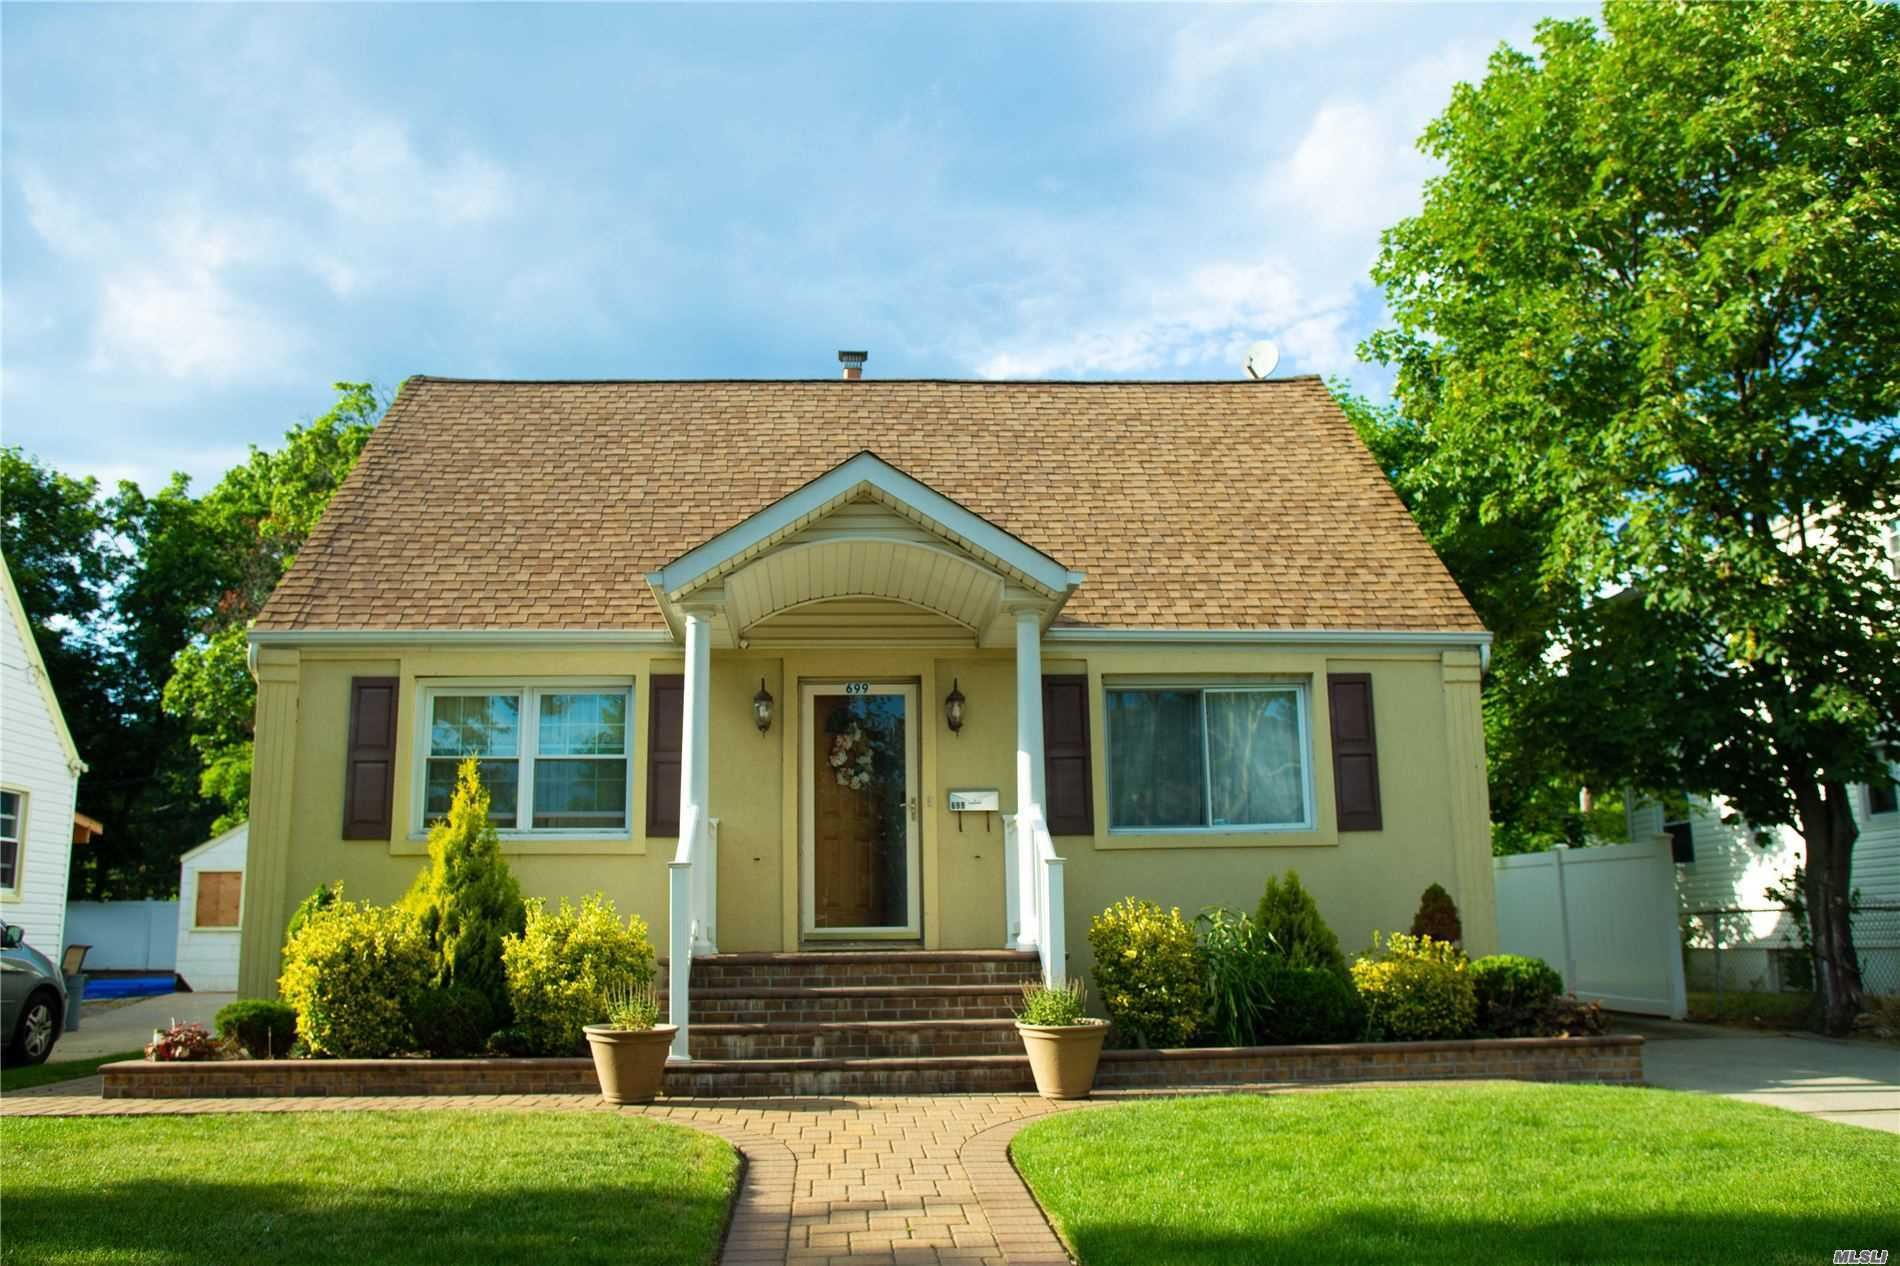 699 Midwood St, Uniondale, NY 11553 - MLS#: 3227042